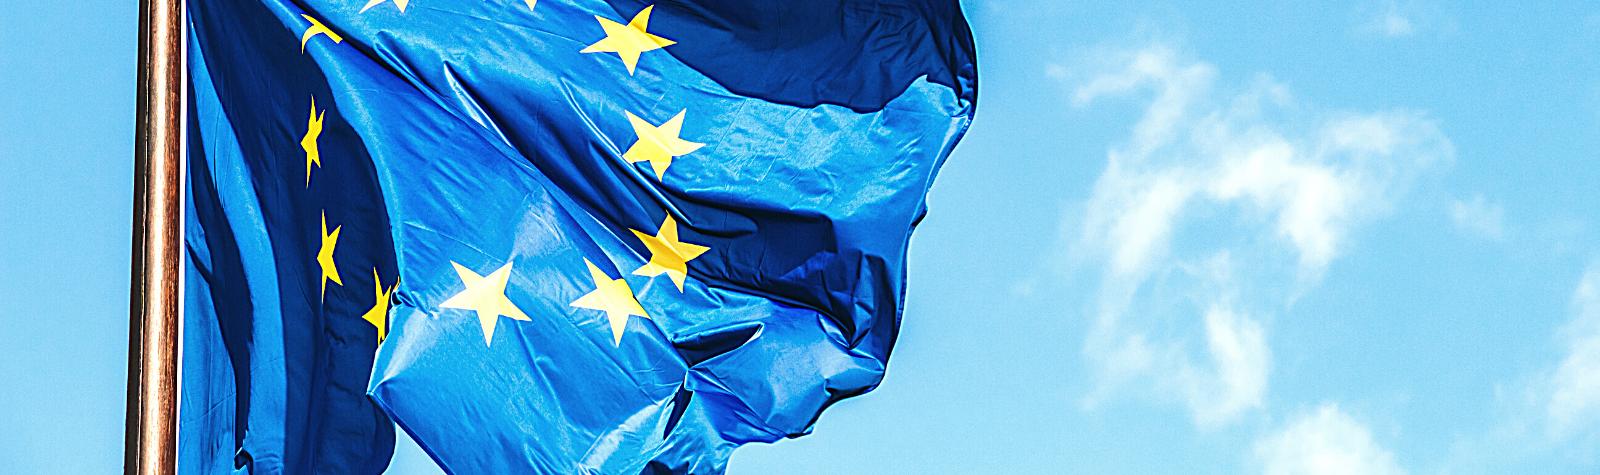 UE: Accordi preferenziali- versione gennaio 2021